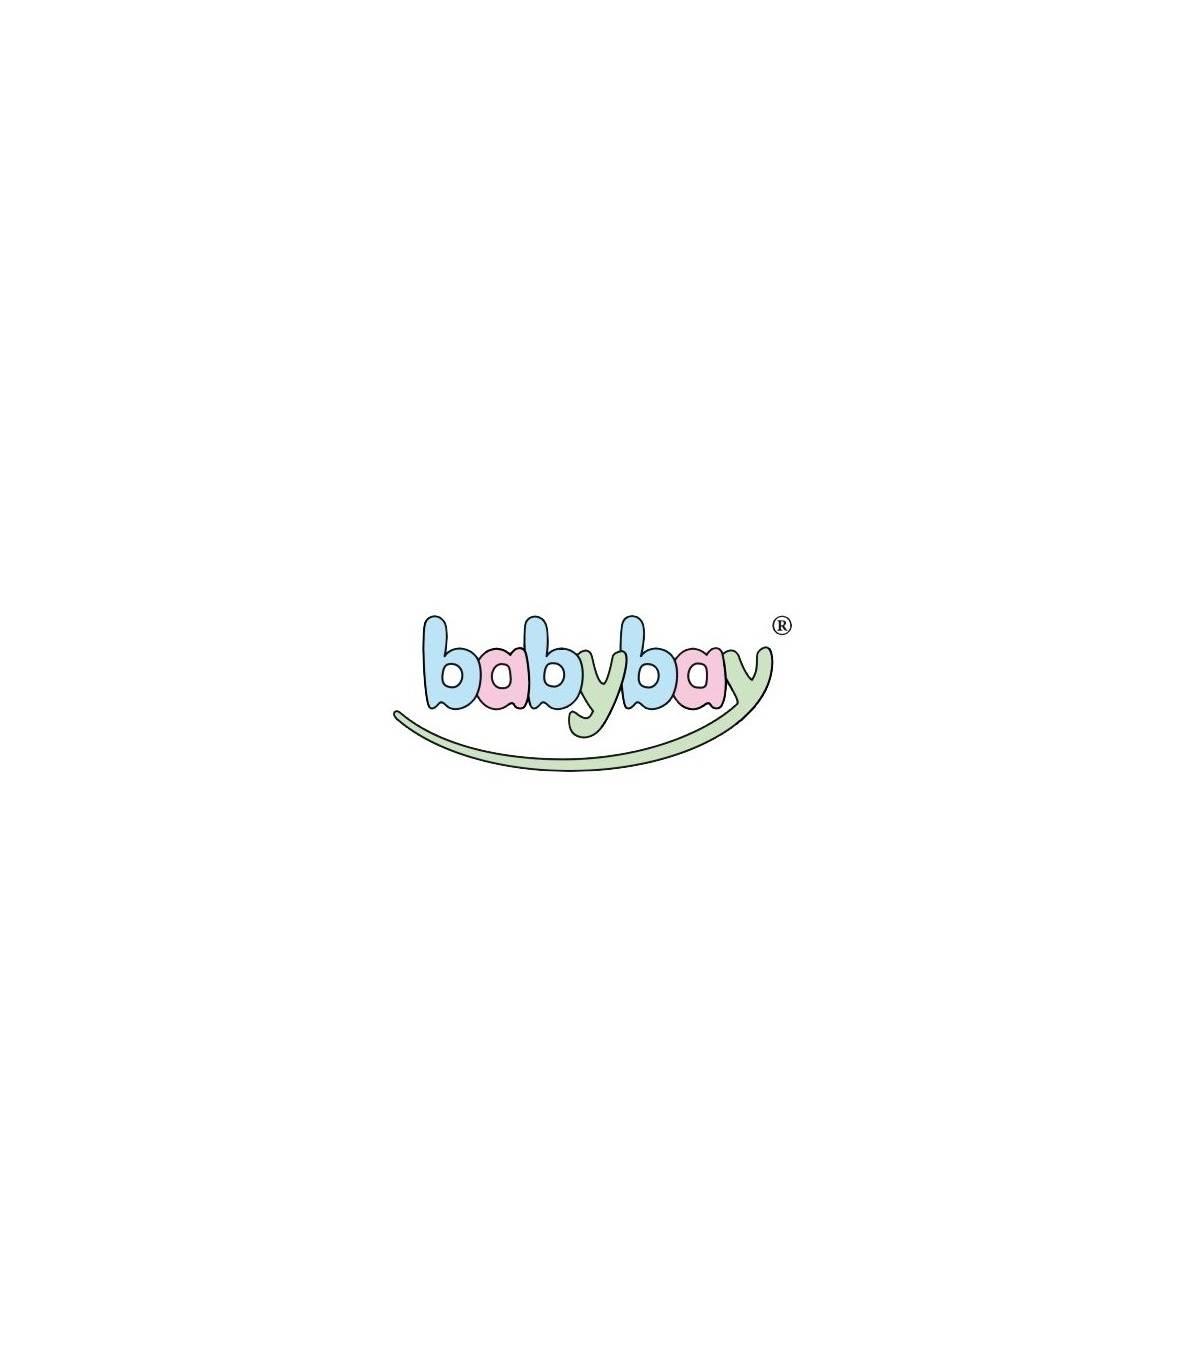 Babybay Himmel Sterne-Weiss